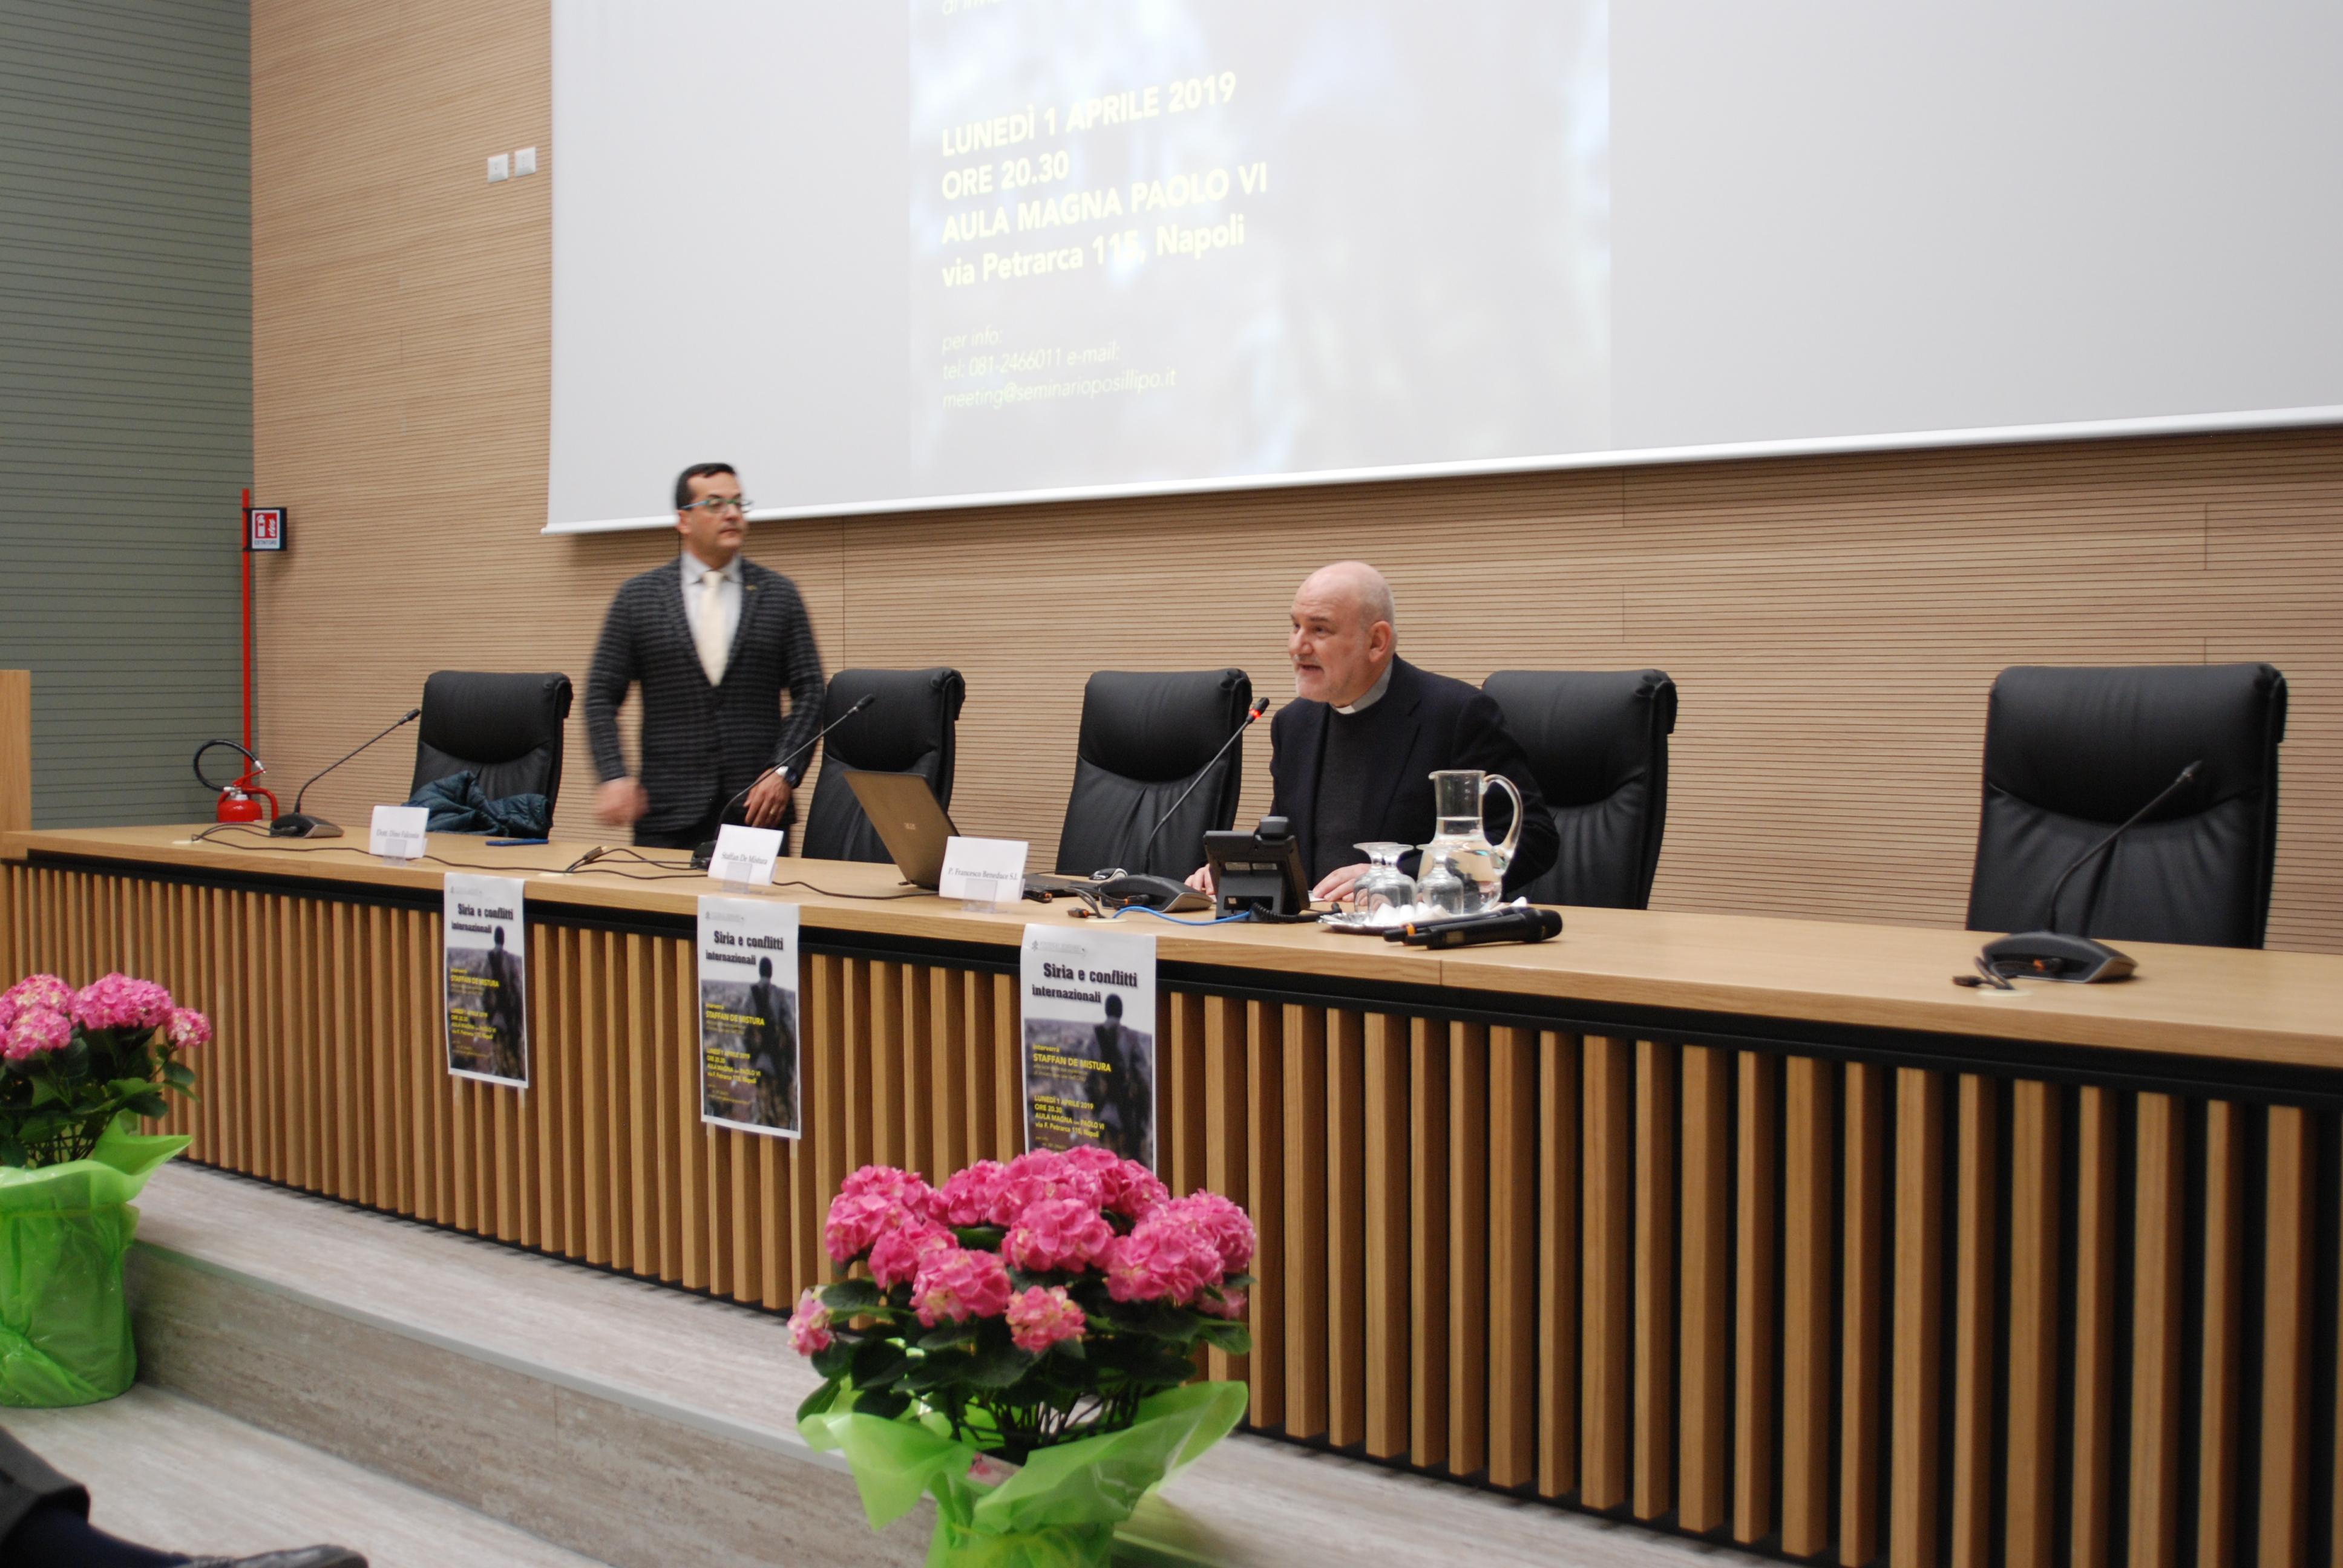 Staffan de Mistura in seminario (10)